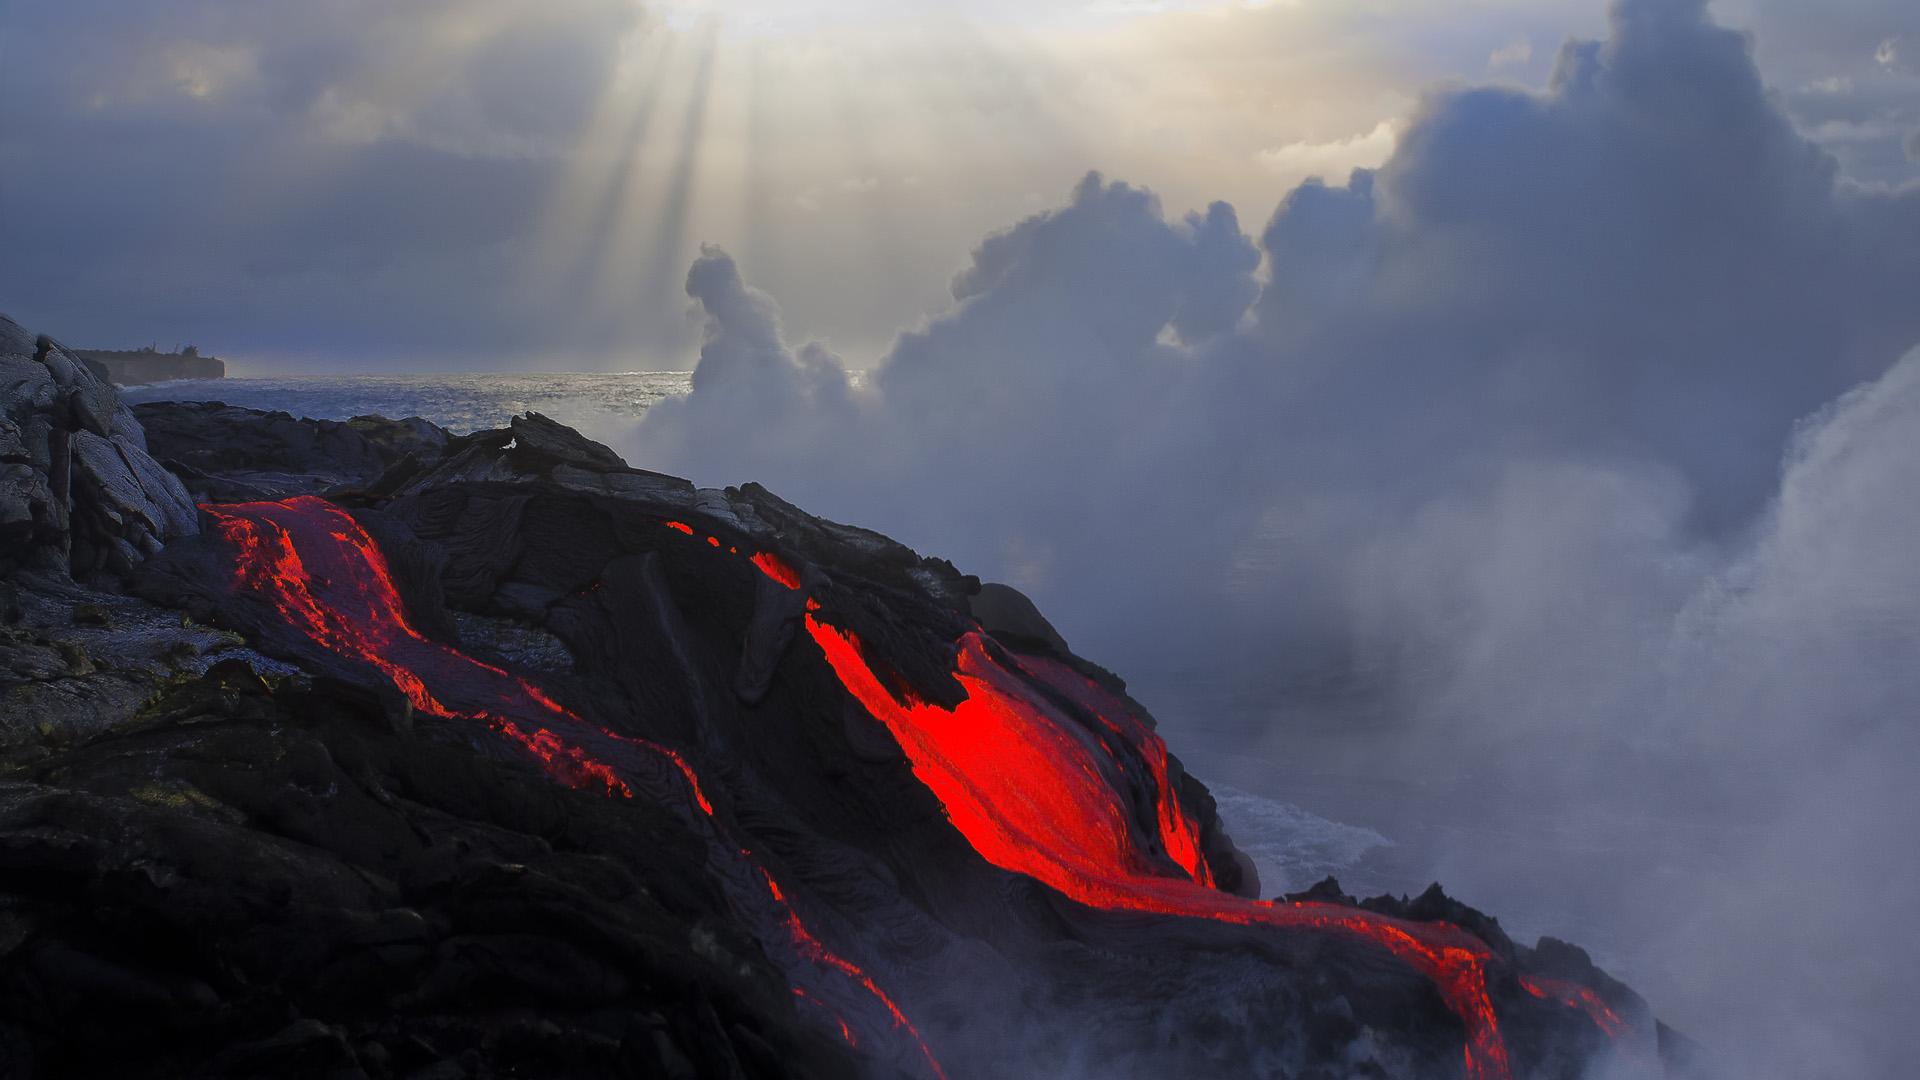 Volcano Wallpapers Hd: 9 HD Volcano Lava Wallpapers